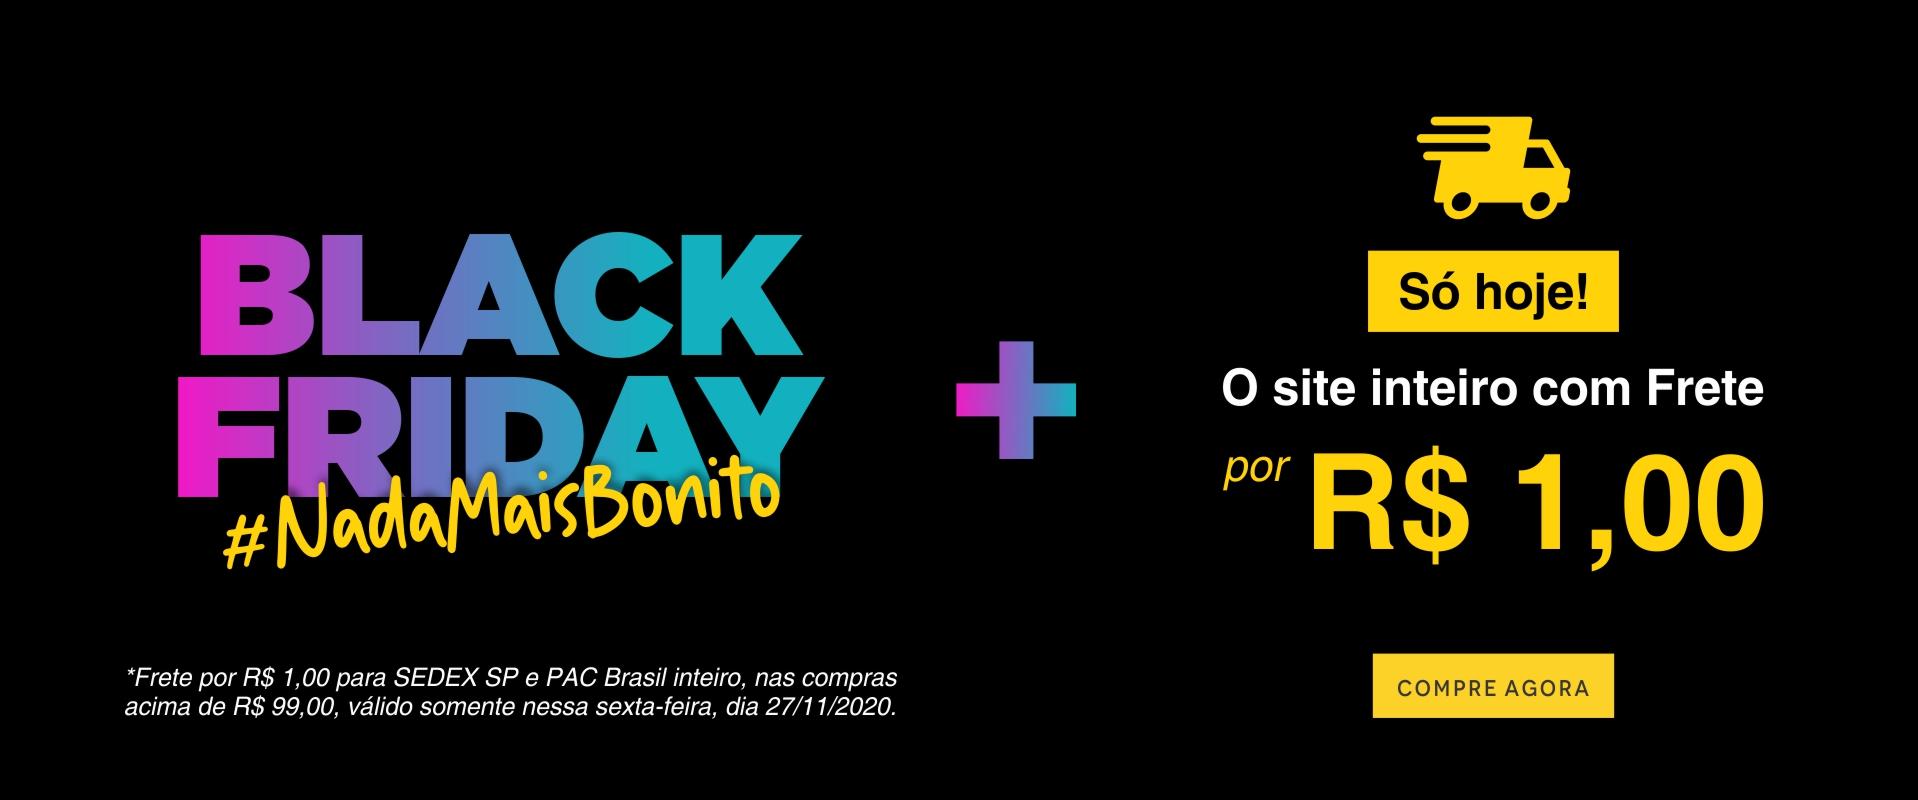 Black + Frete